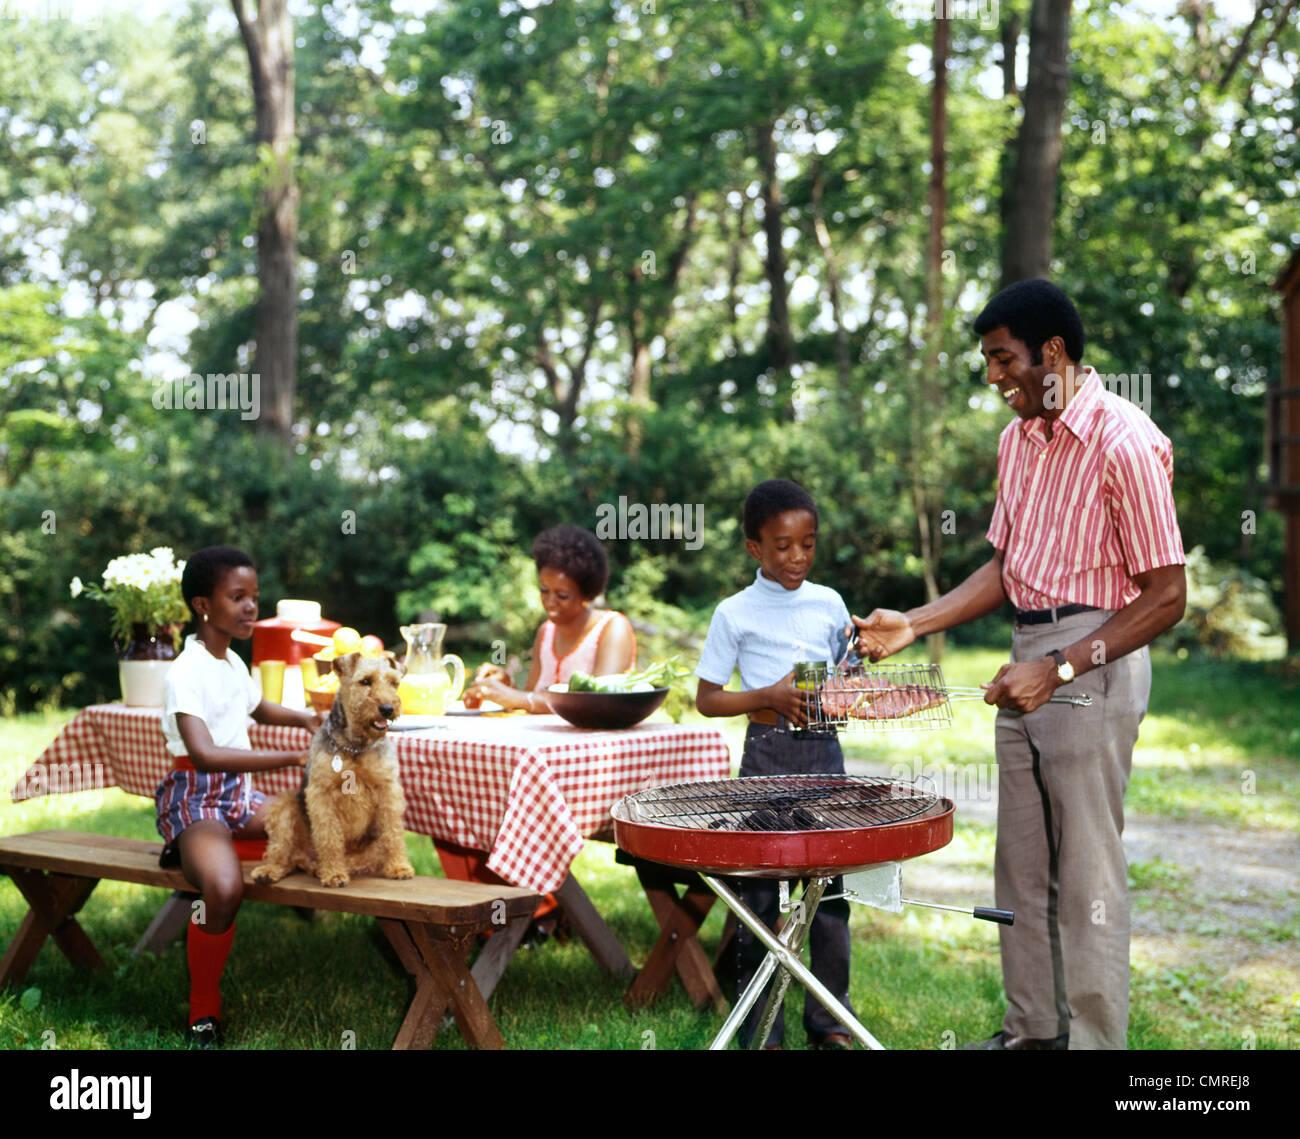 1970s man woman backyard picnic table meal eating food brownies